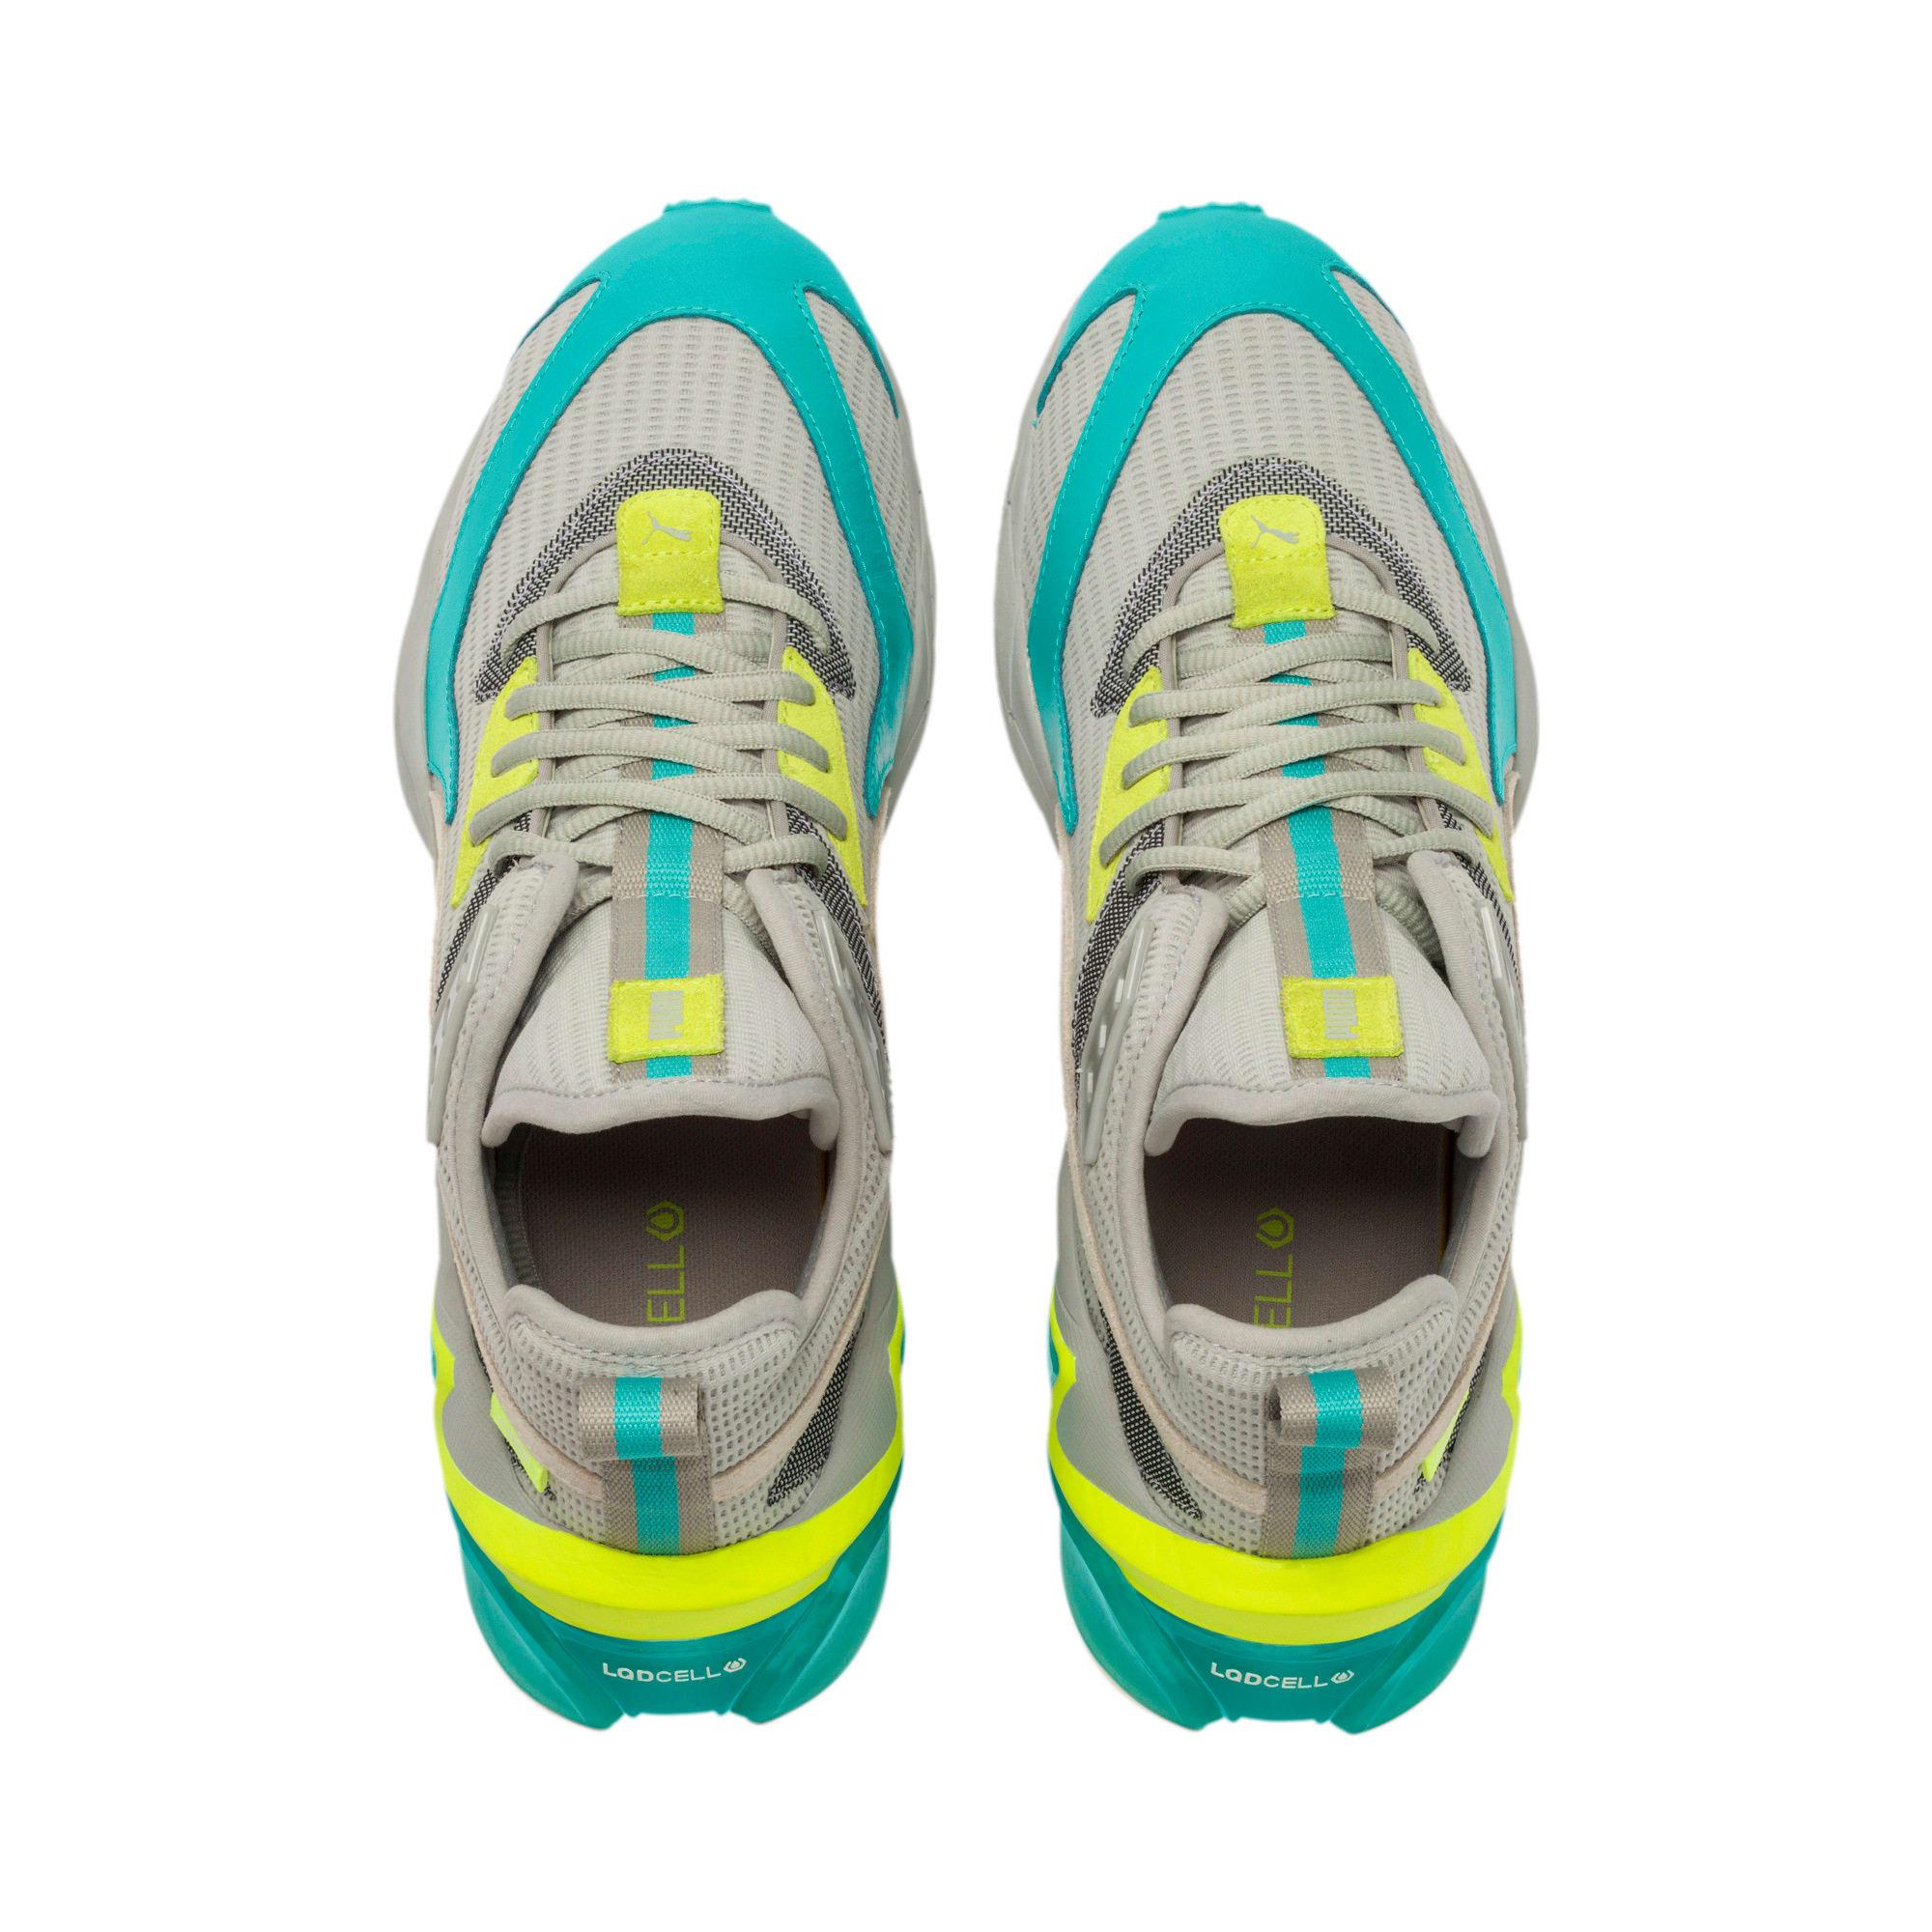 Thumbnail 7 of LQDCELL Origin Men's Training Shoes, High Rise-Blue Turquoise, medium